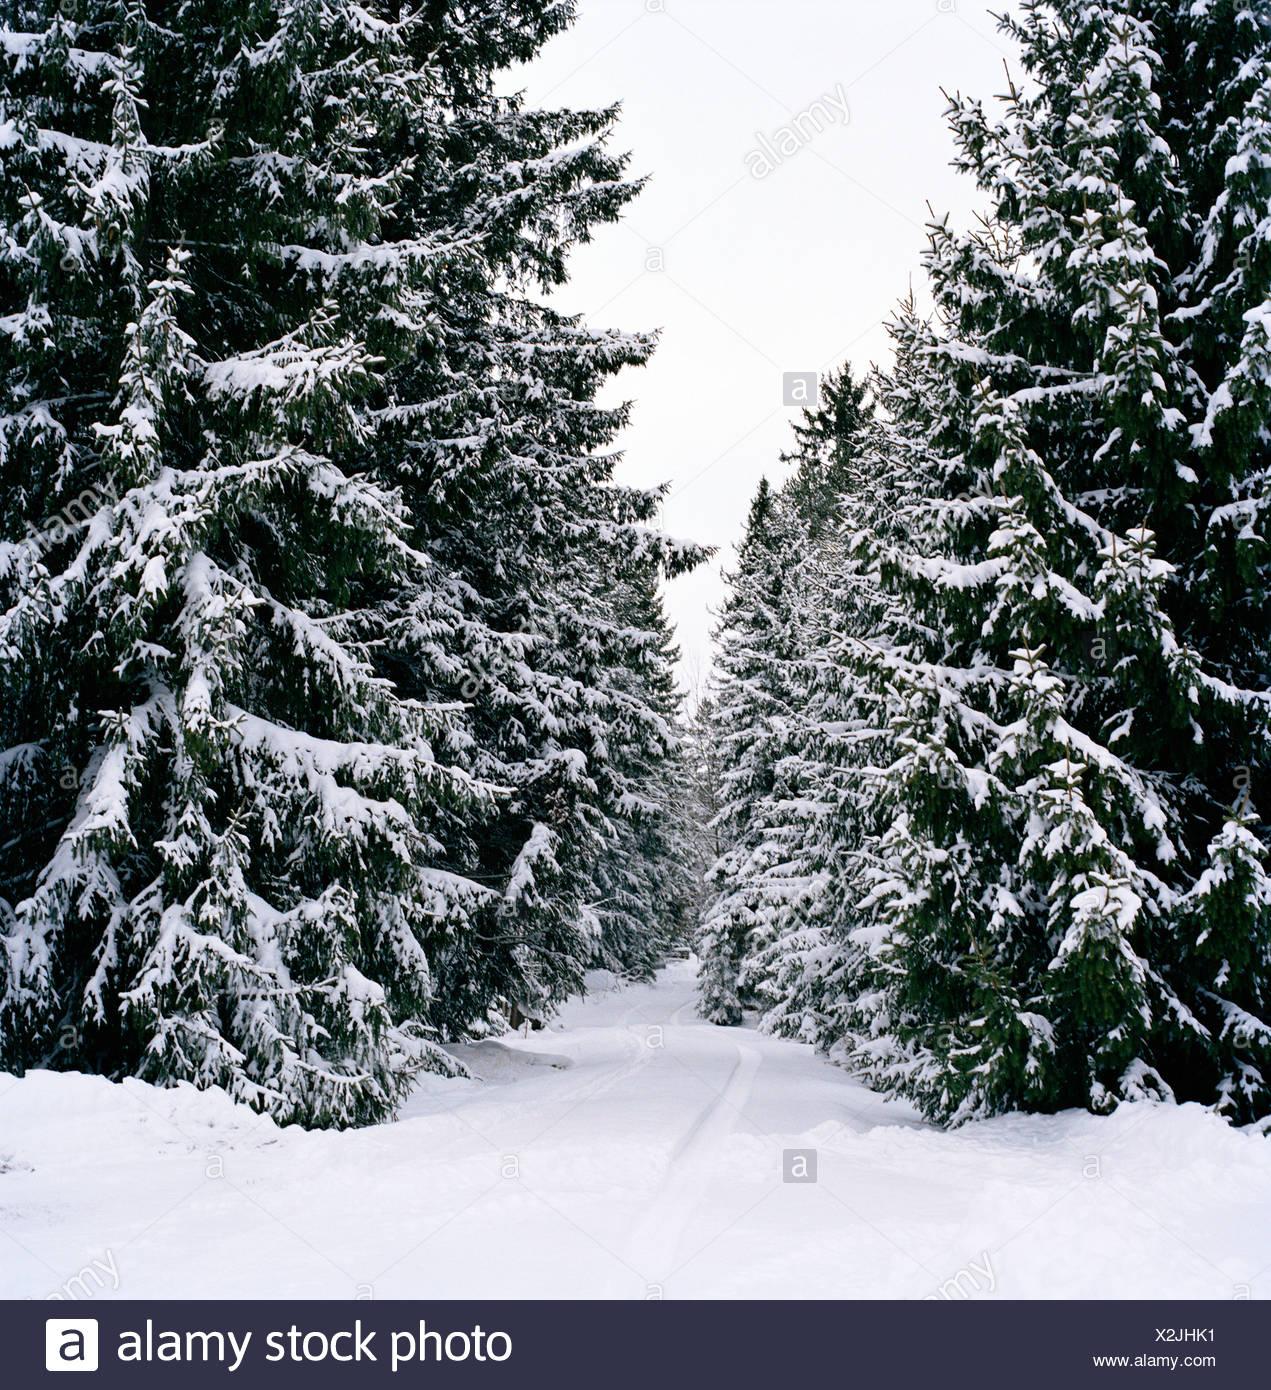 Snowy spruce fir Sweden - Stock Image